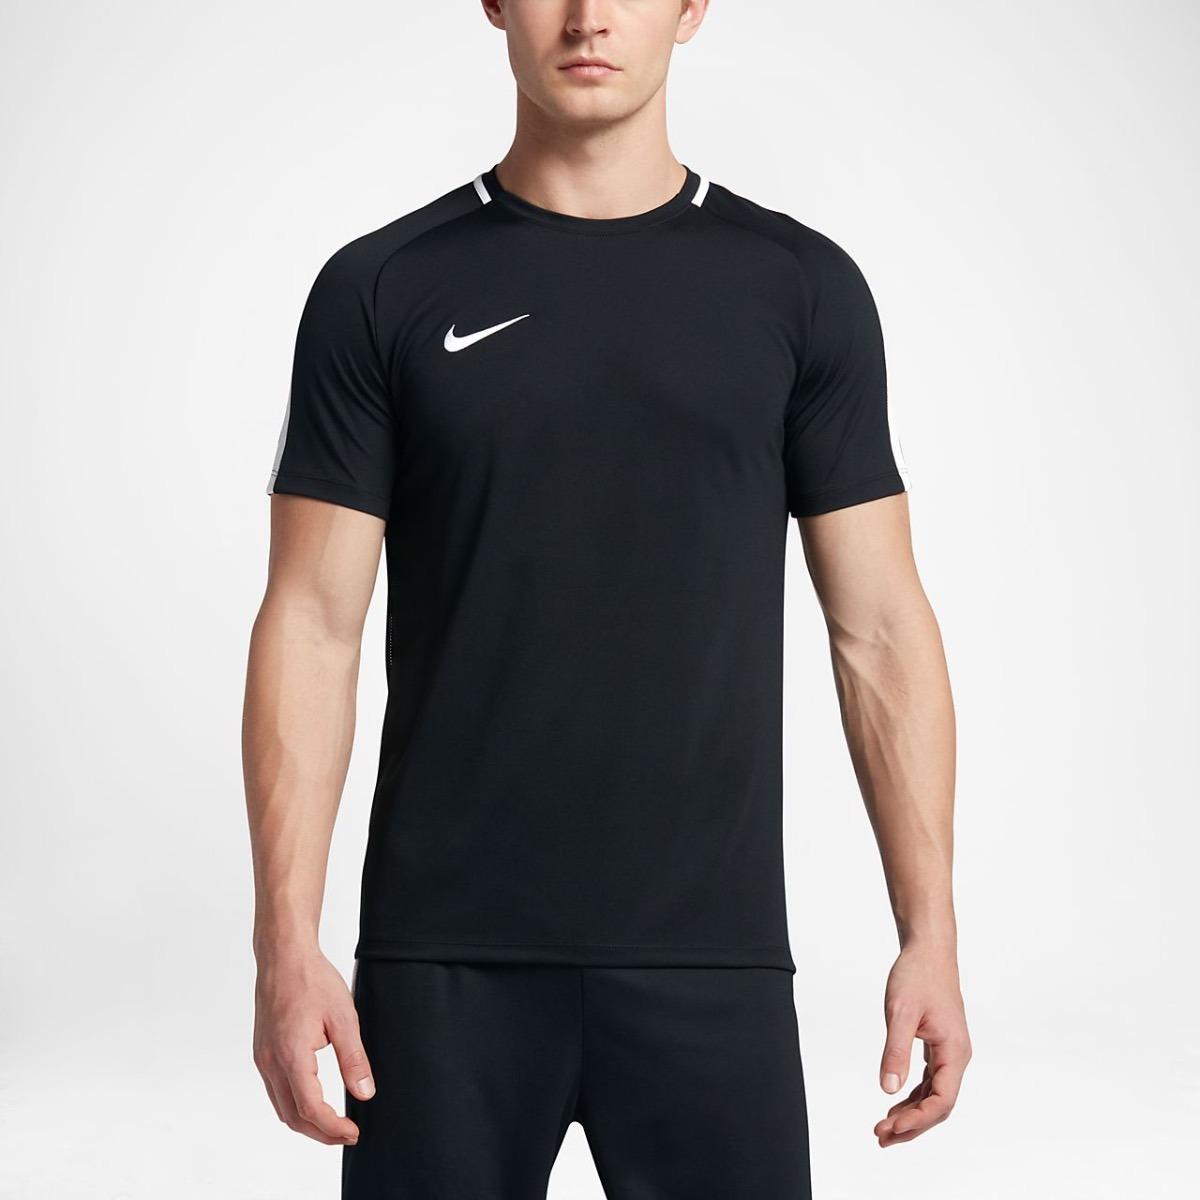 50c59081 playera nike dry academy top futbol gimnasio gym training. Cargando zoom.